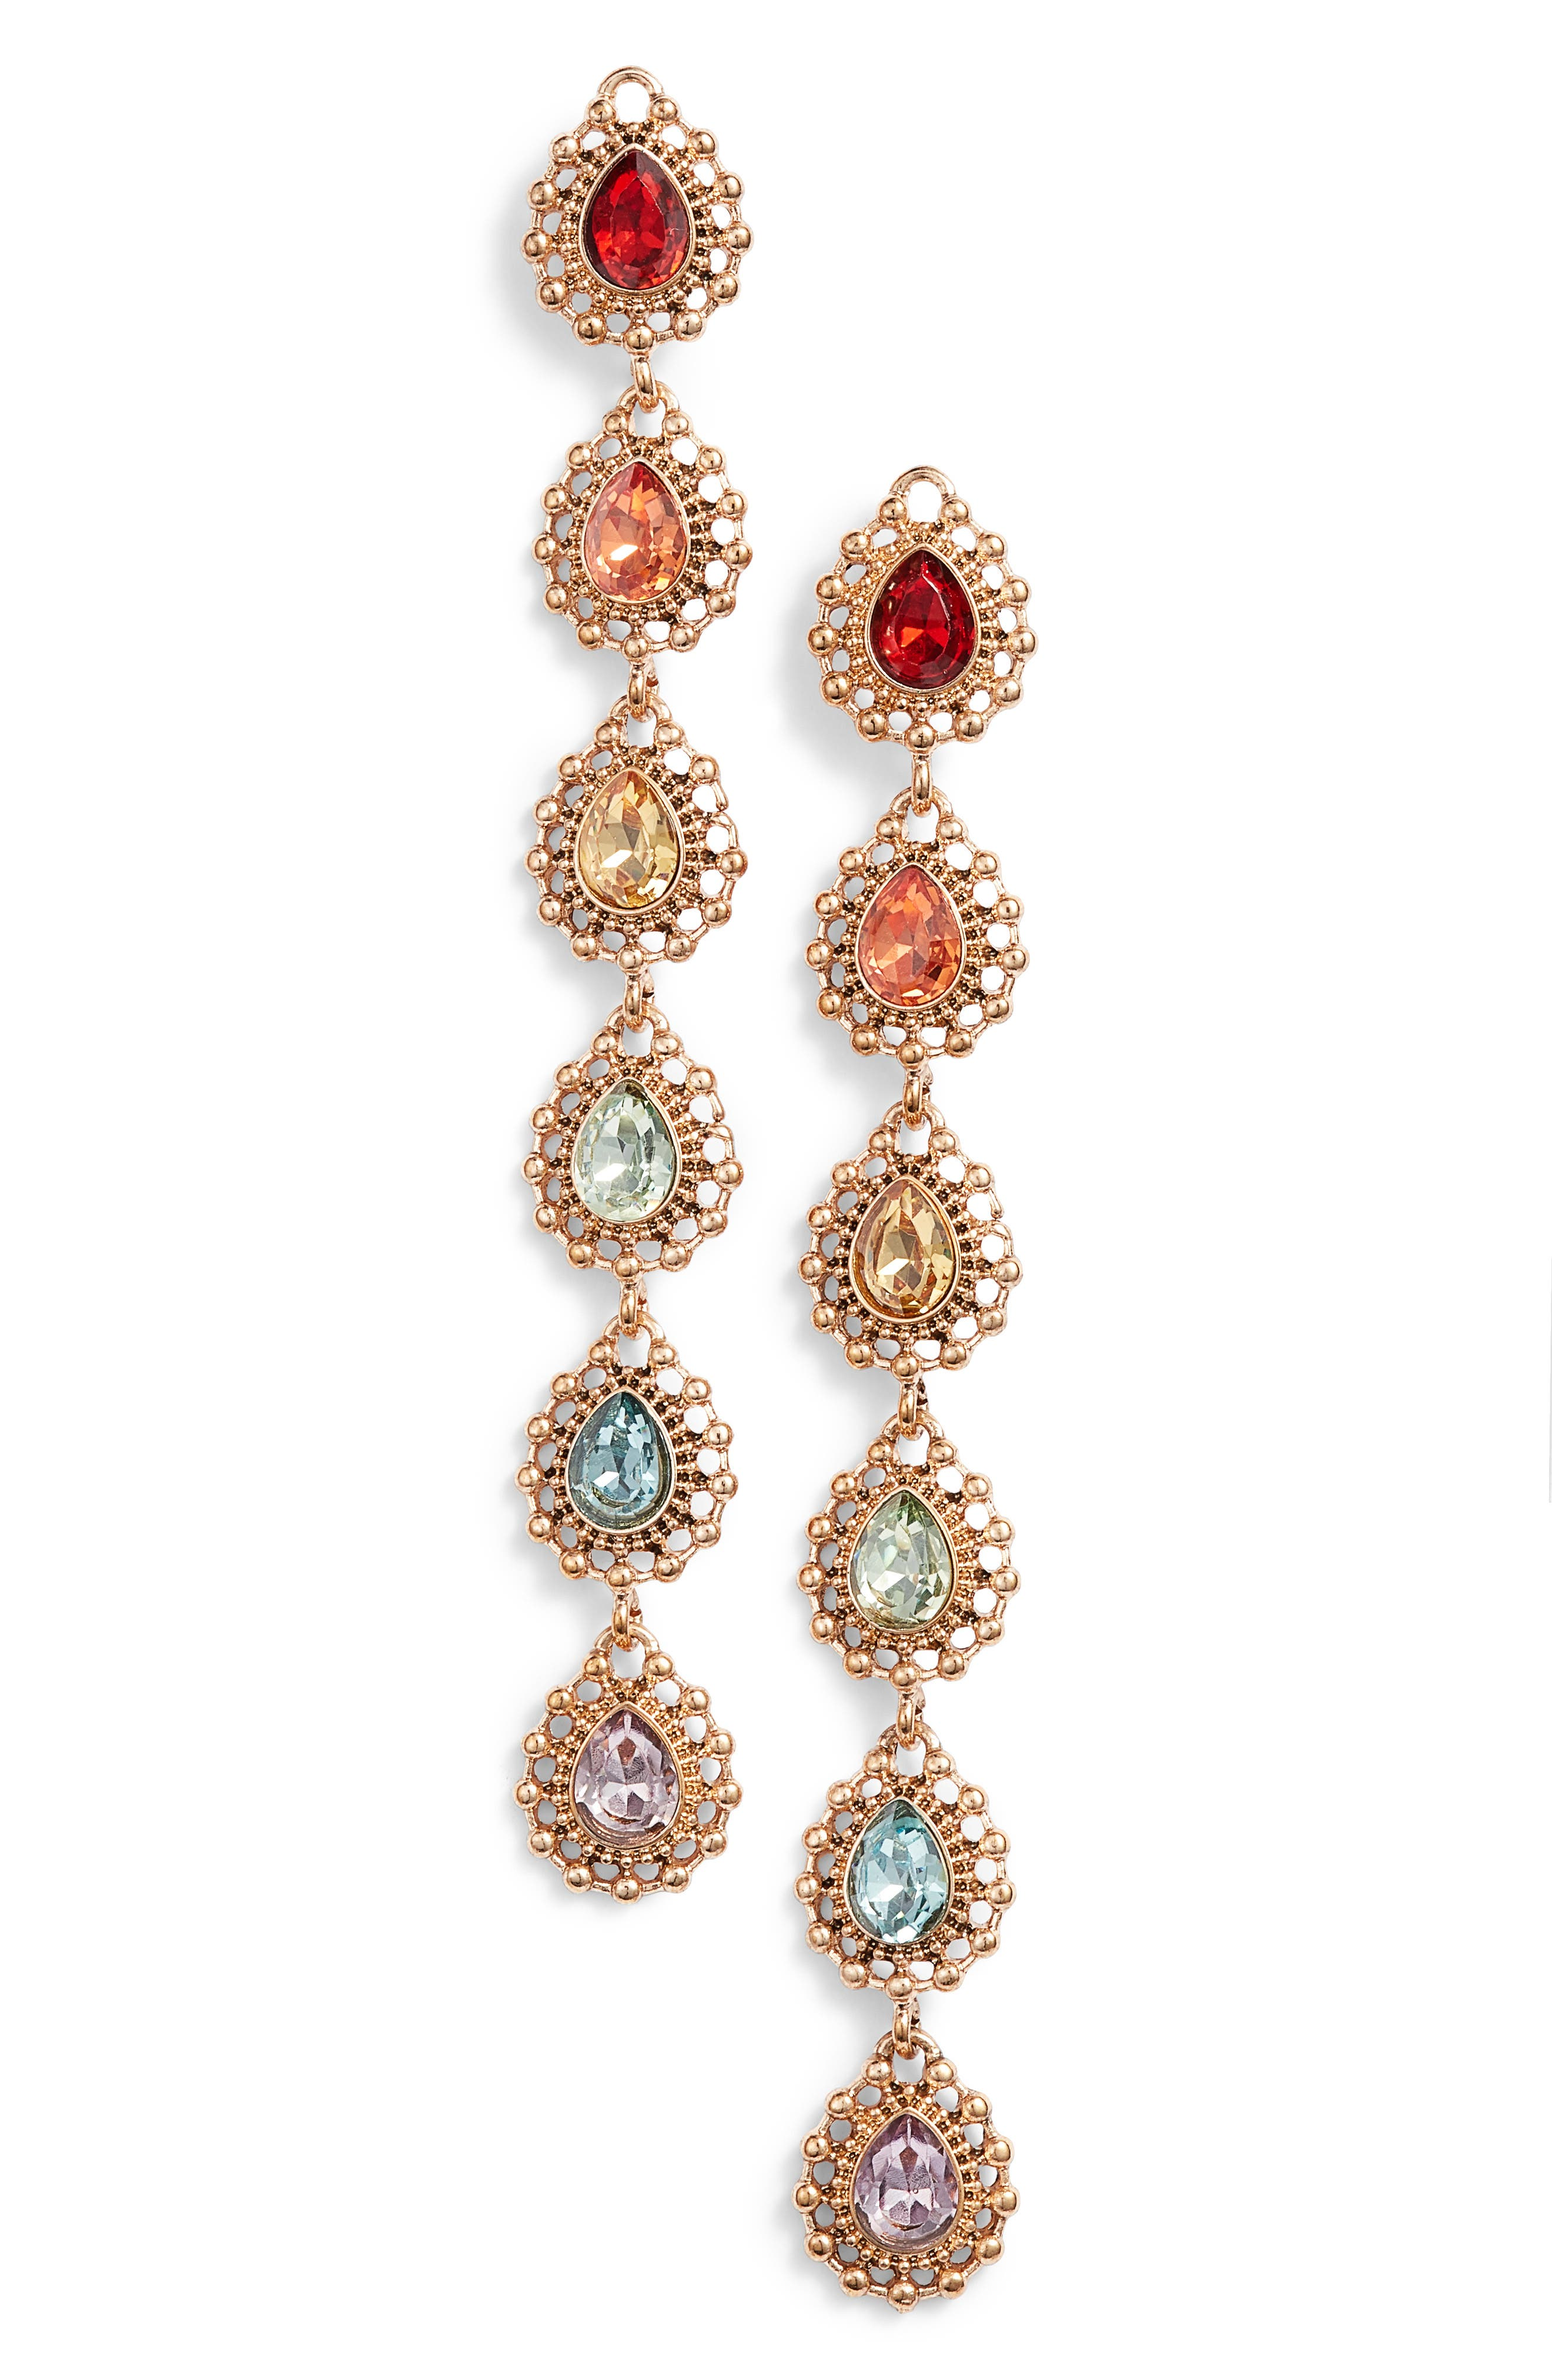 Ombré Crystal Drop Earrings,                         Main,                         color, Gold/ Multi